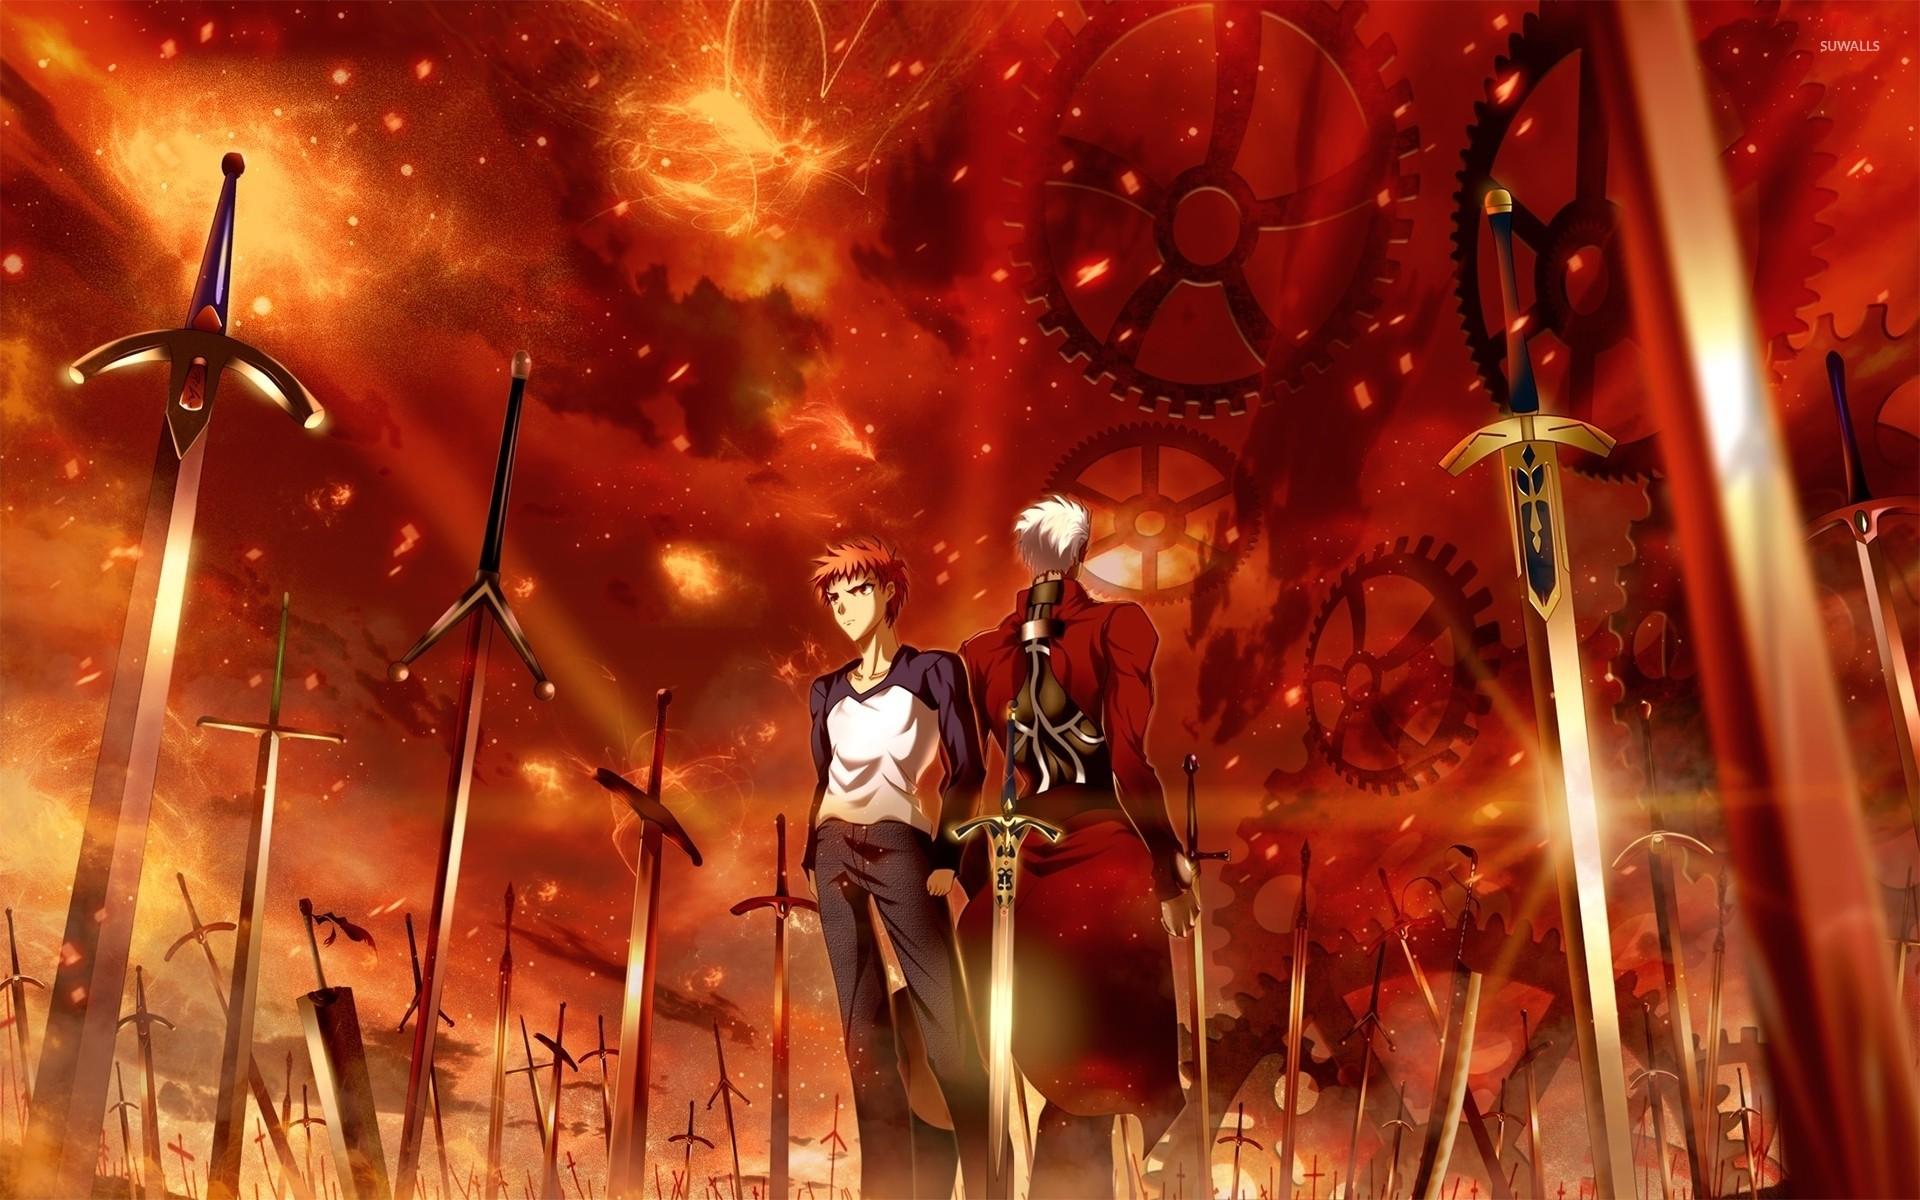 Fate Stay Night Archer Wallpaper Full Hd As Wallpaper HD